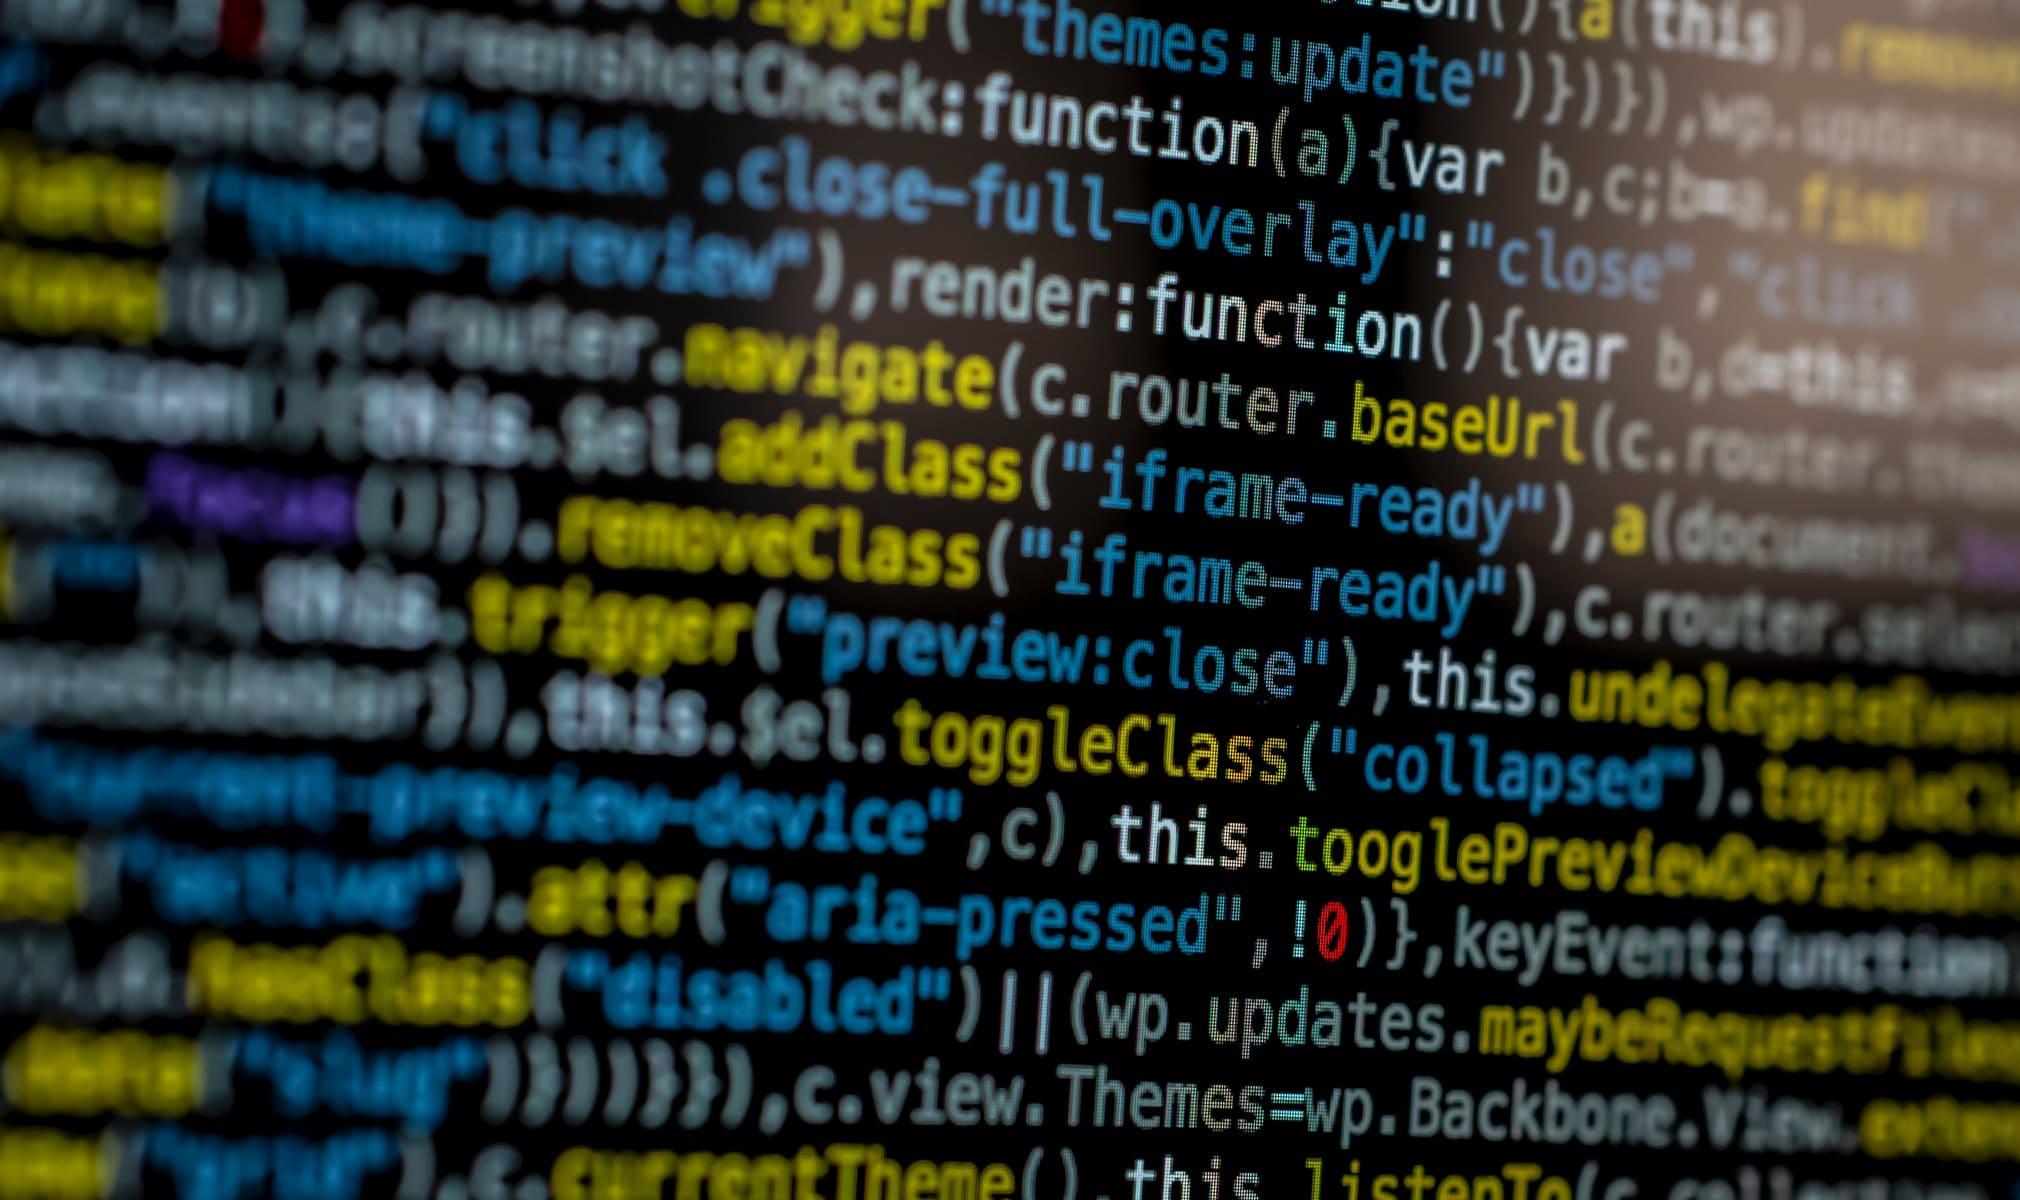 A screen full of code